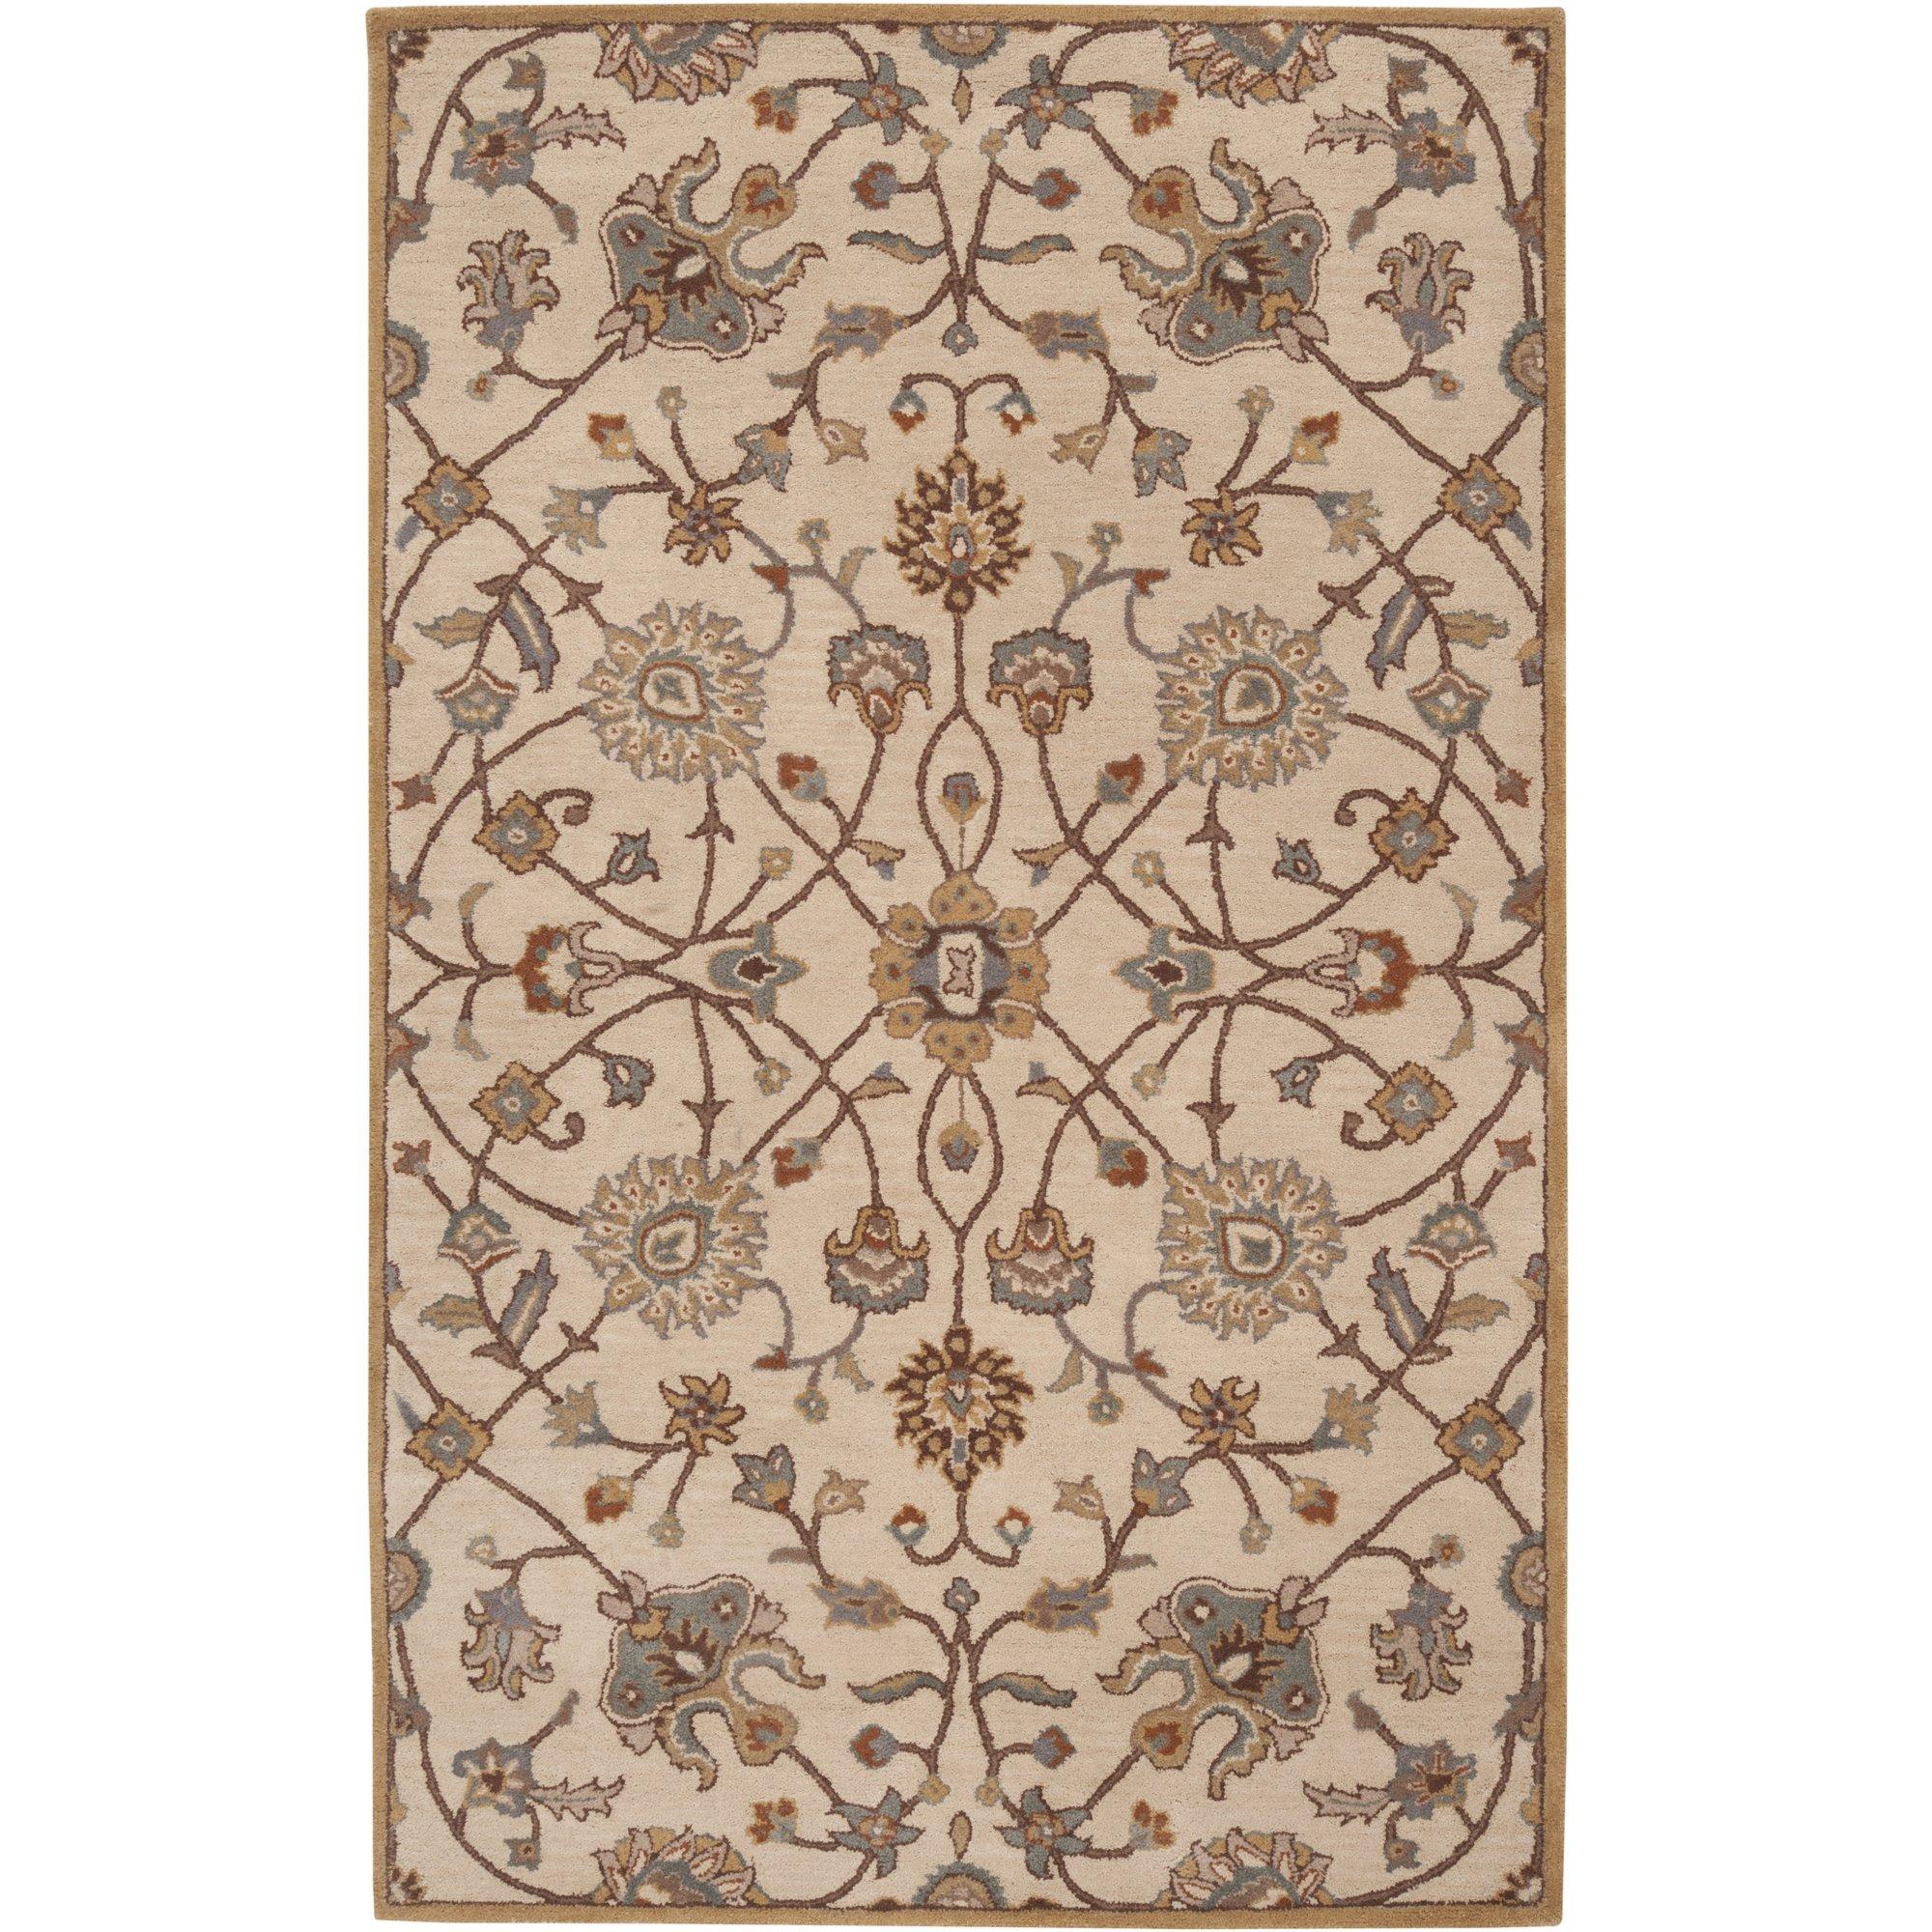 Surya Caesar CAE-1081 Classic Hand Tufted 100% Wool Fatigue Green 2'6'' x 8' Traditional Runner